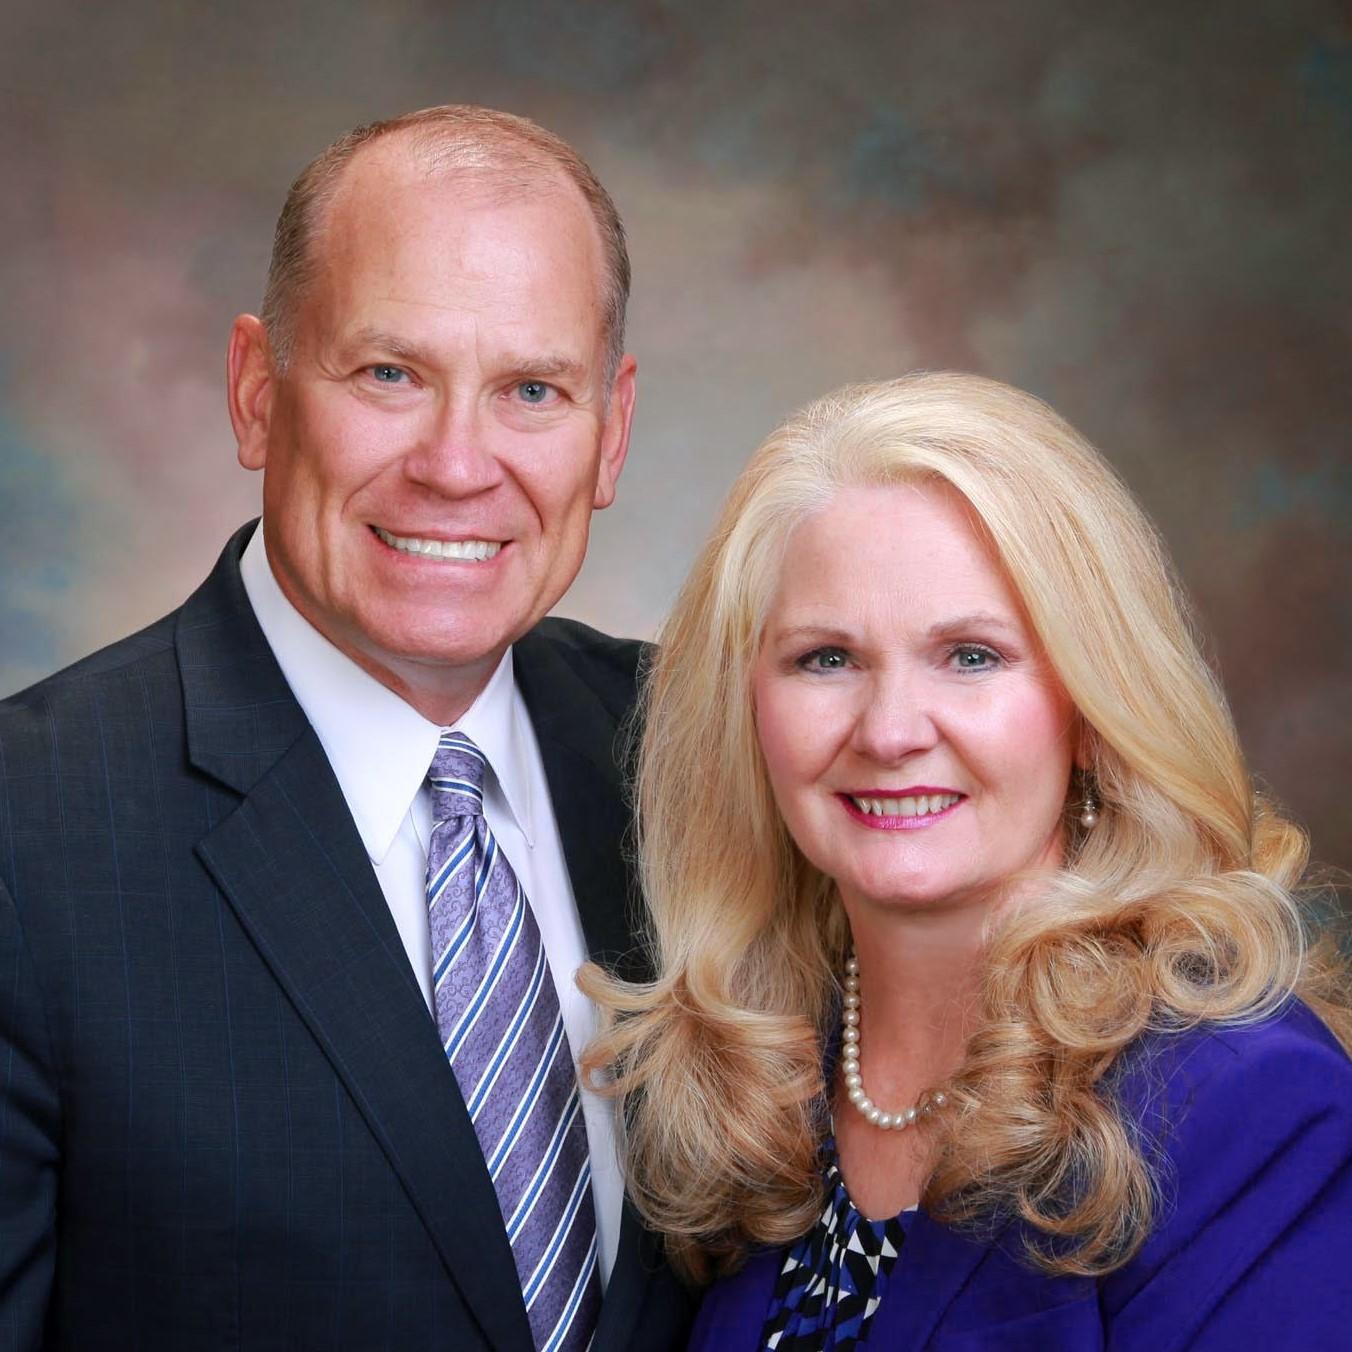 Keith M. and Lori B. Dunford